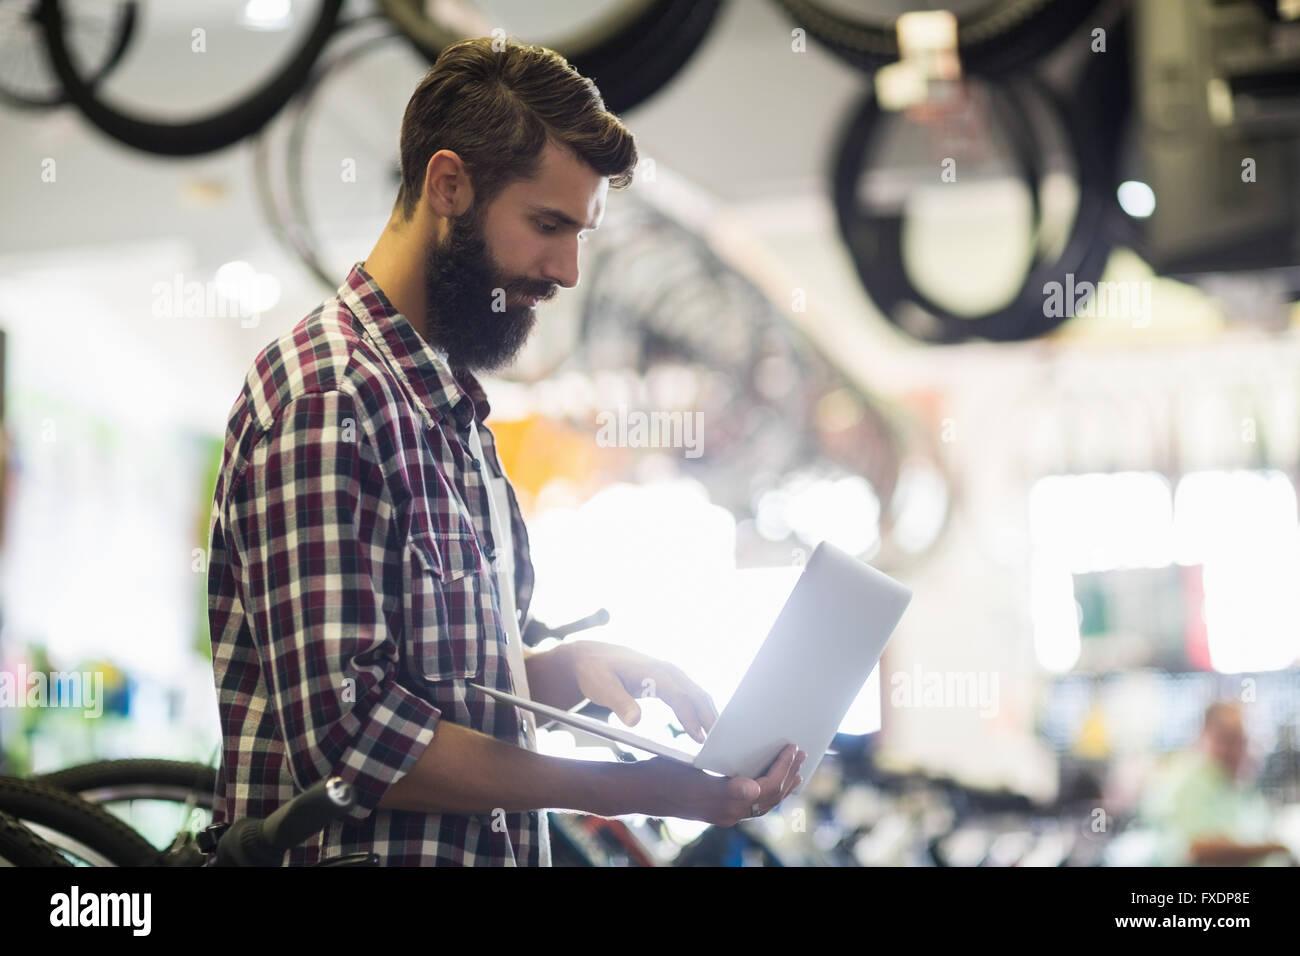 Bike mechanic checking laptop Stock Photo